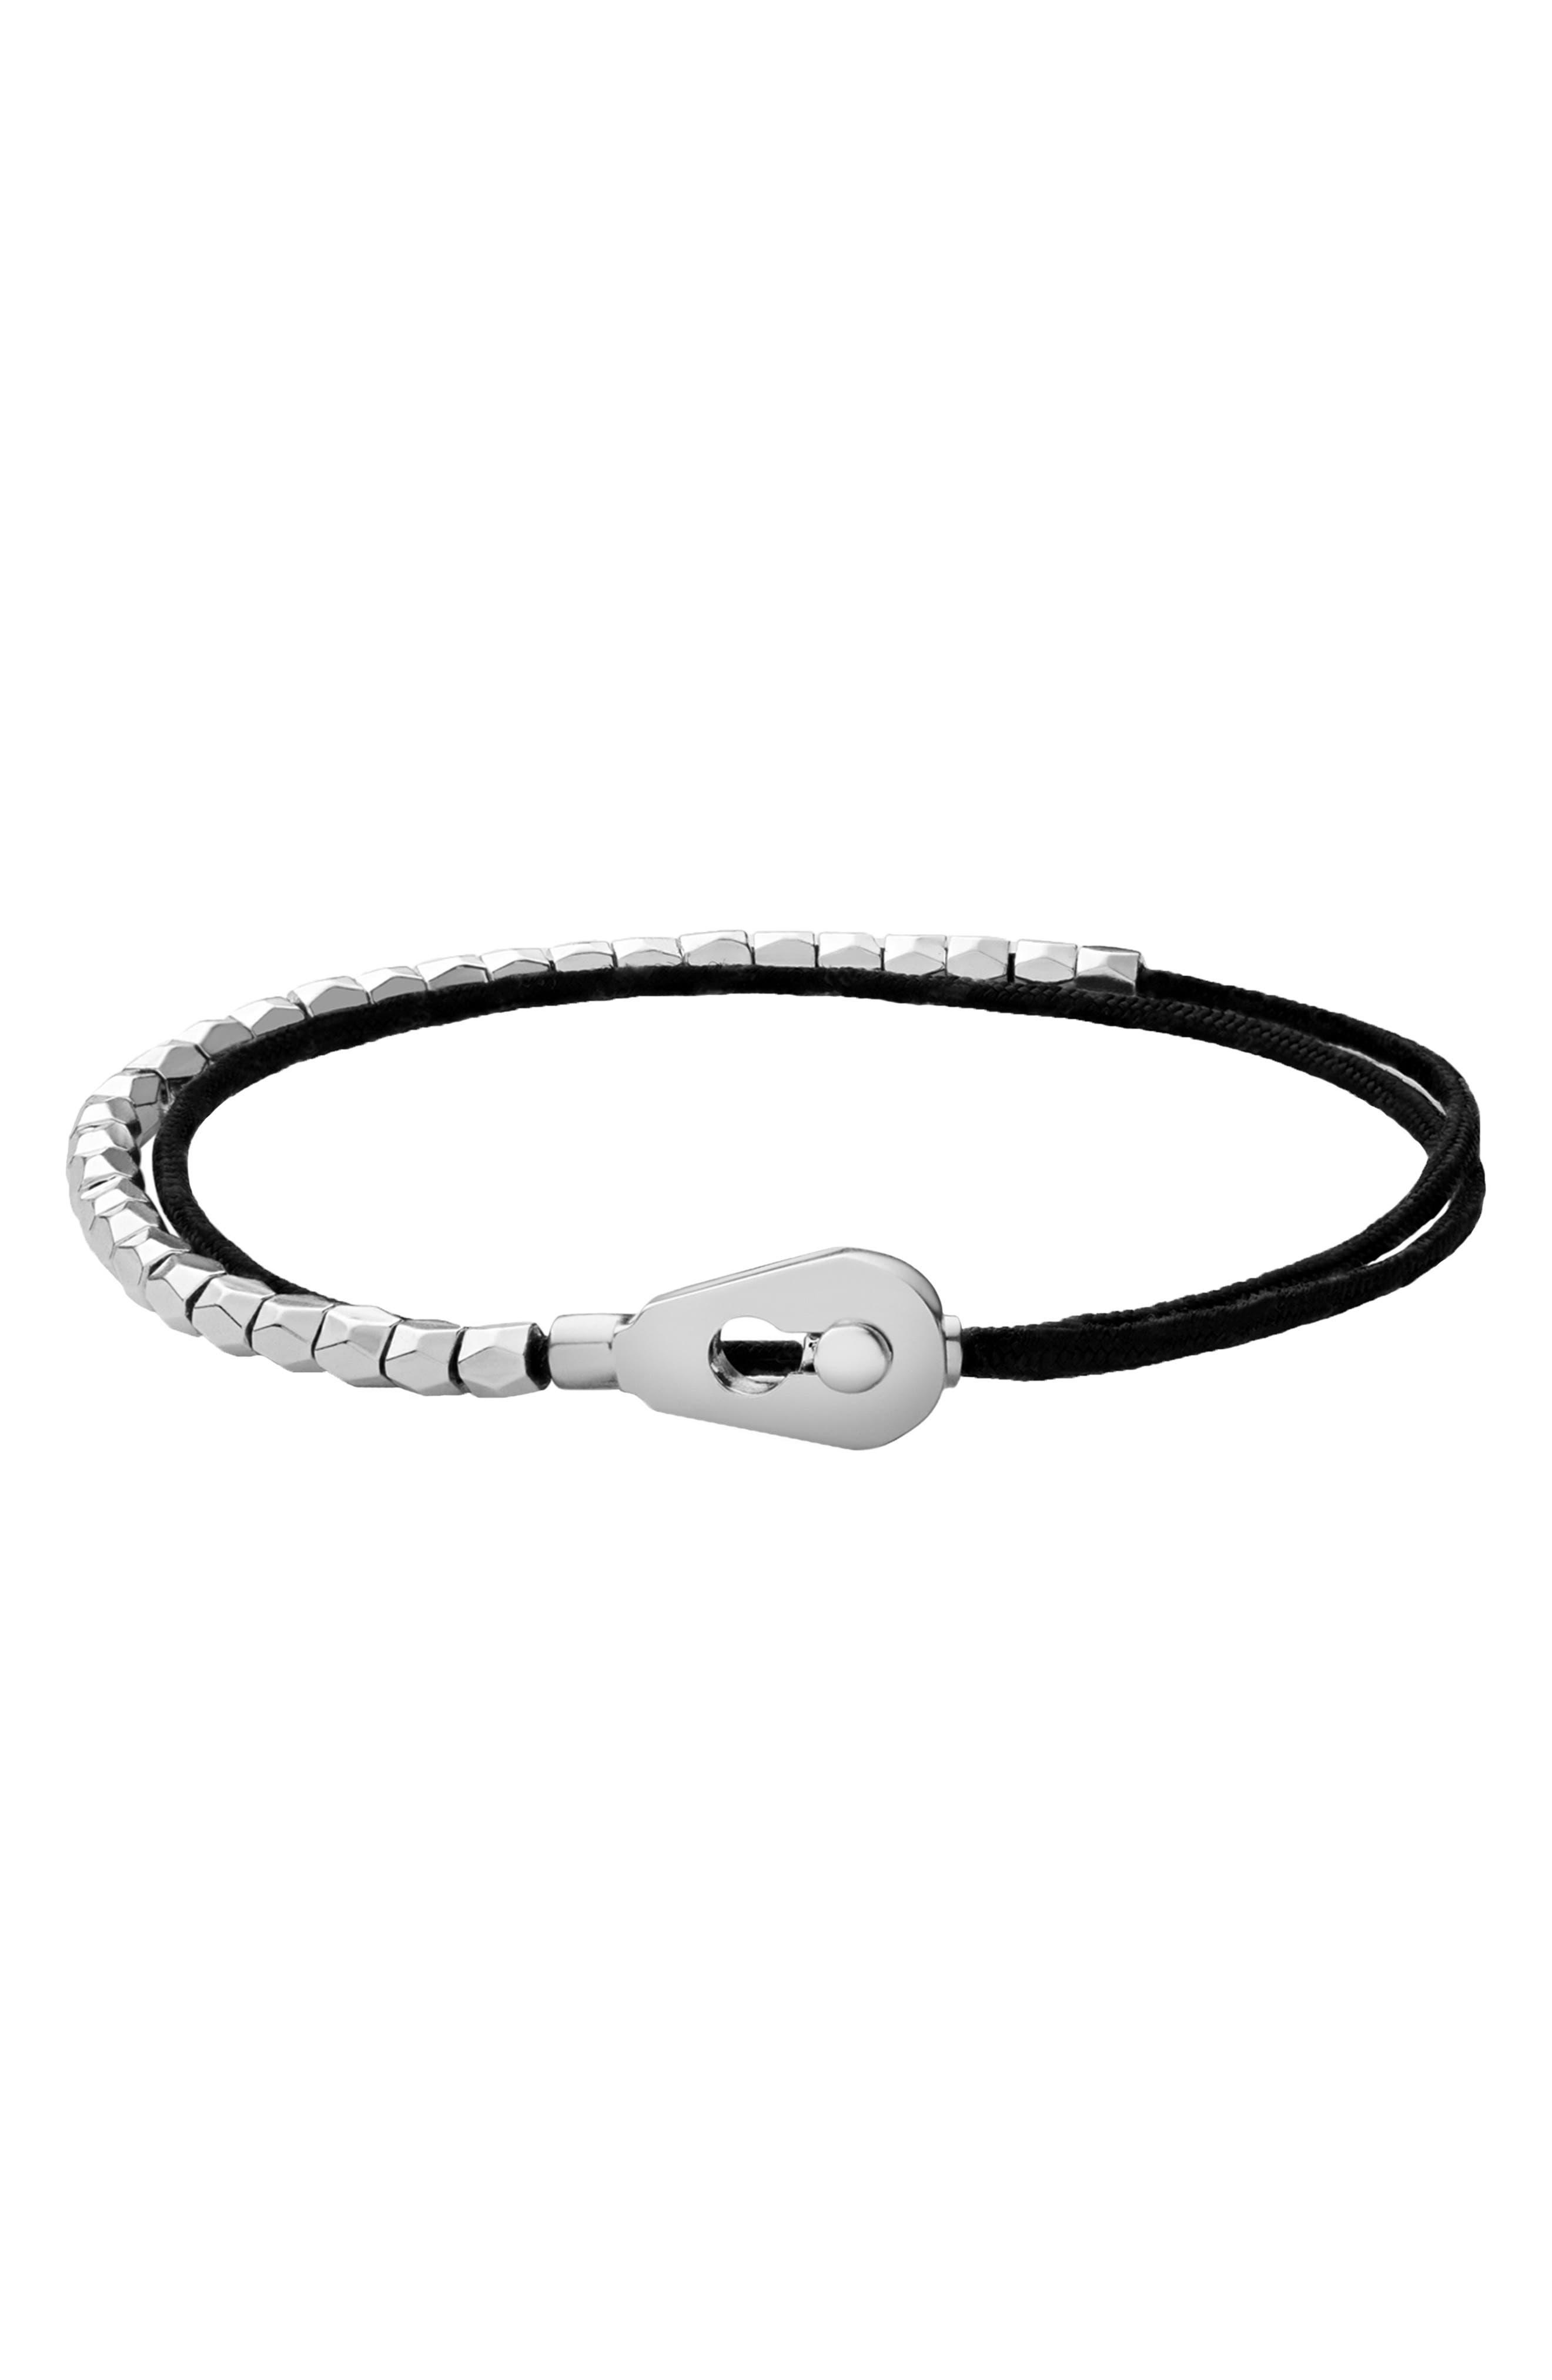 Centra Rope Bracelet,                             Main thumbnail 1, color,                             BLACK